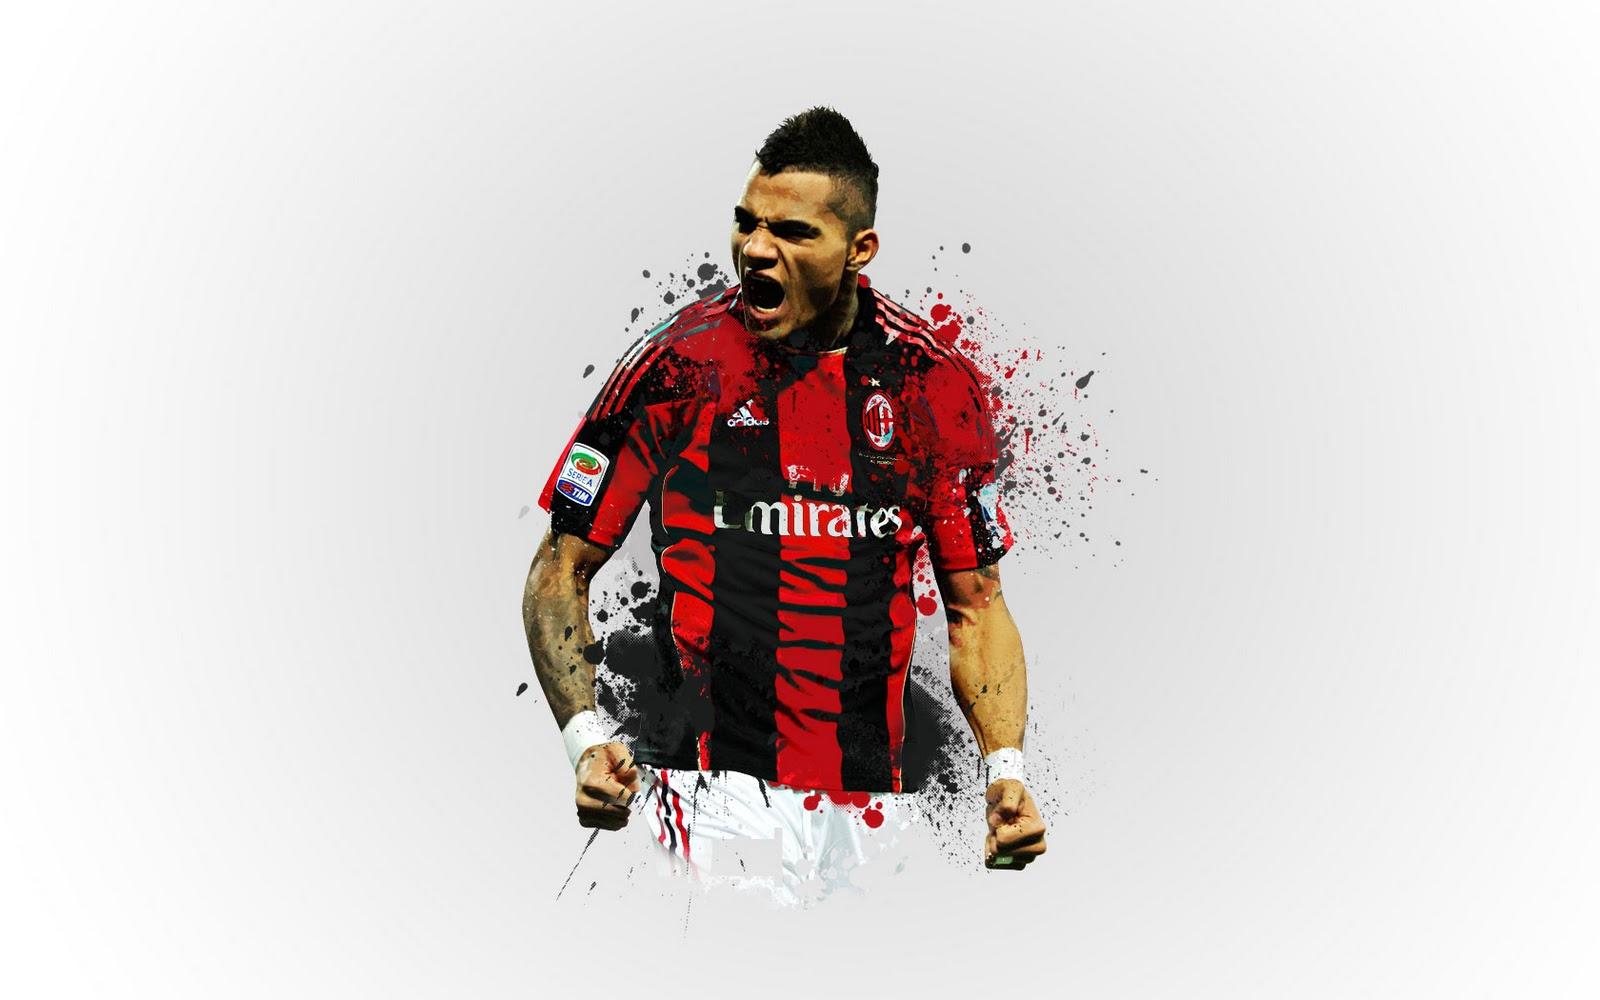 http://2.bp.blogspot.com/-Ze25CbqiHu0/Tt99TP7L2DI/AAAAAAAABec/o4Hp_wmW-B4/s1600/Kevin-Prince-Boateng-Wallpaper-Midfielder-ac-milan-team-squad-2011-wallpaper.jpg